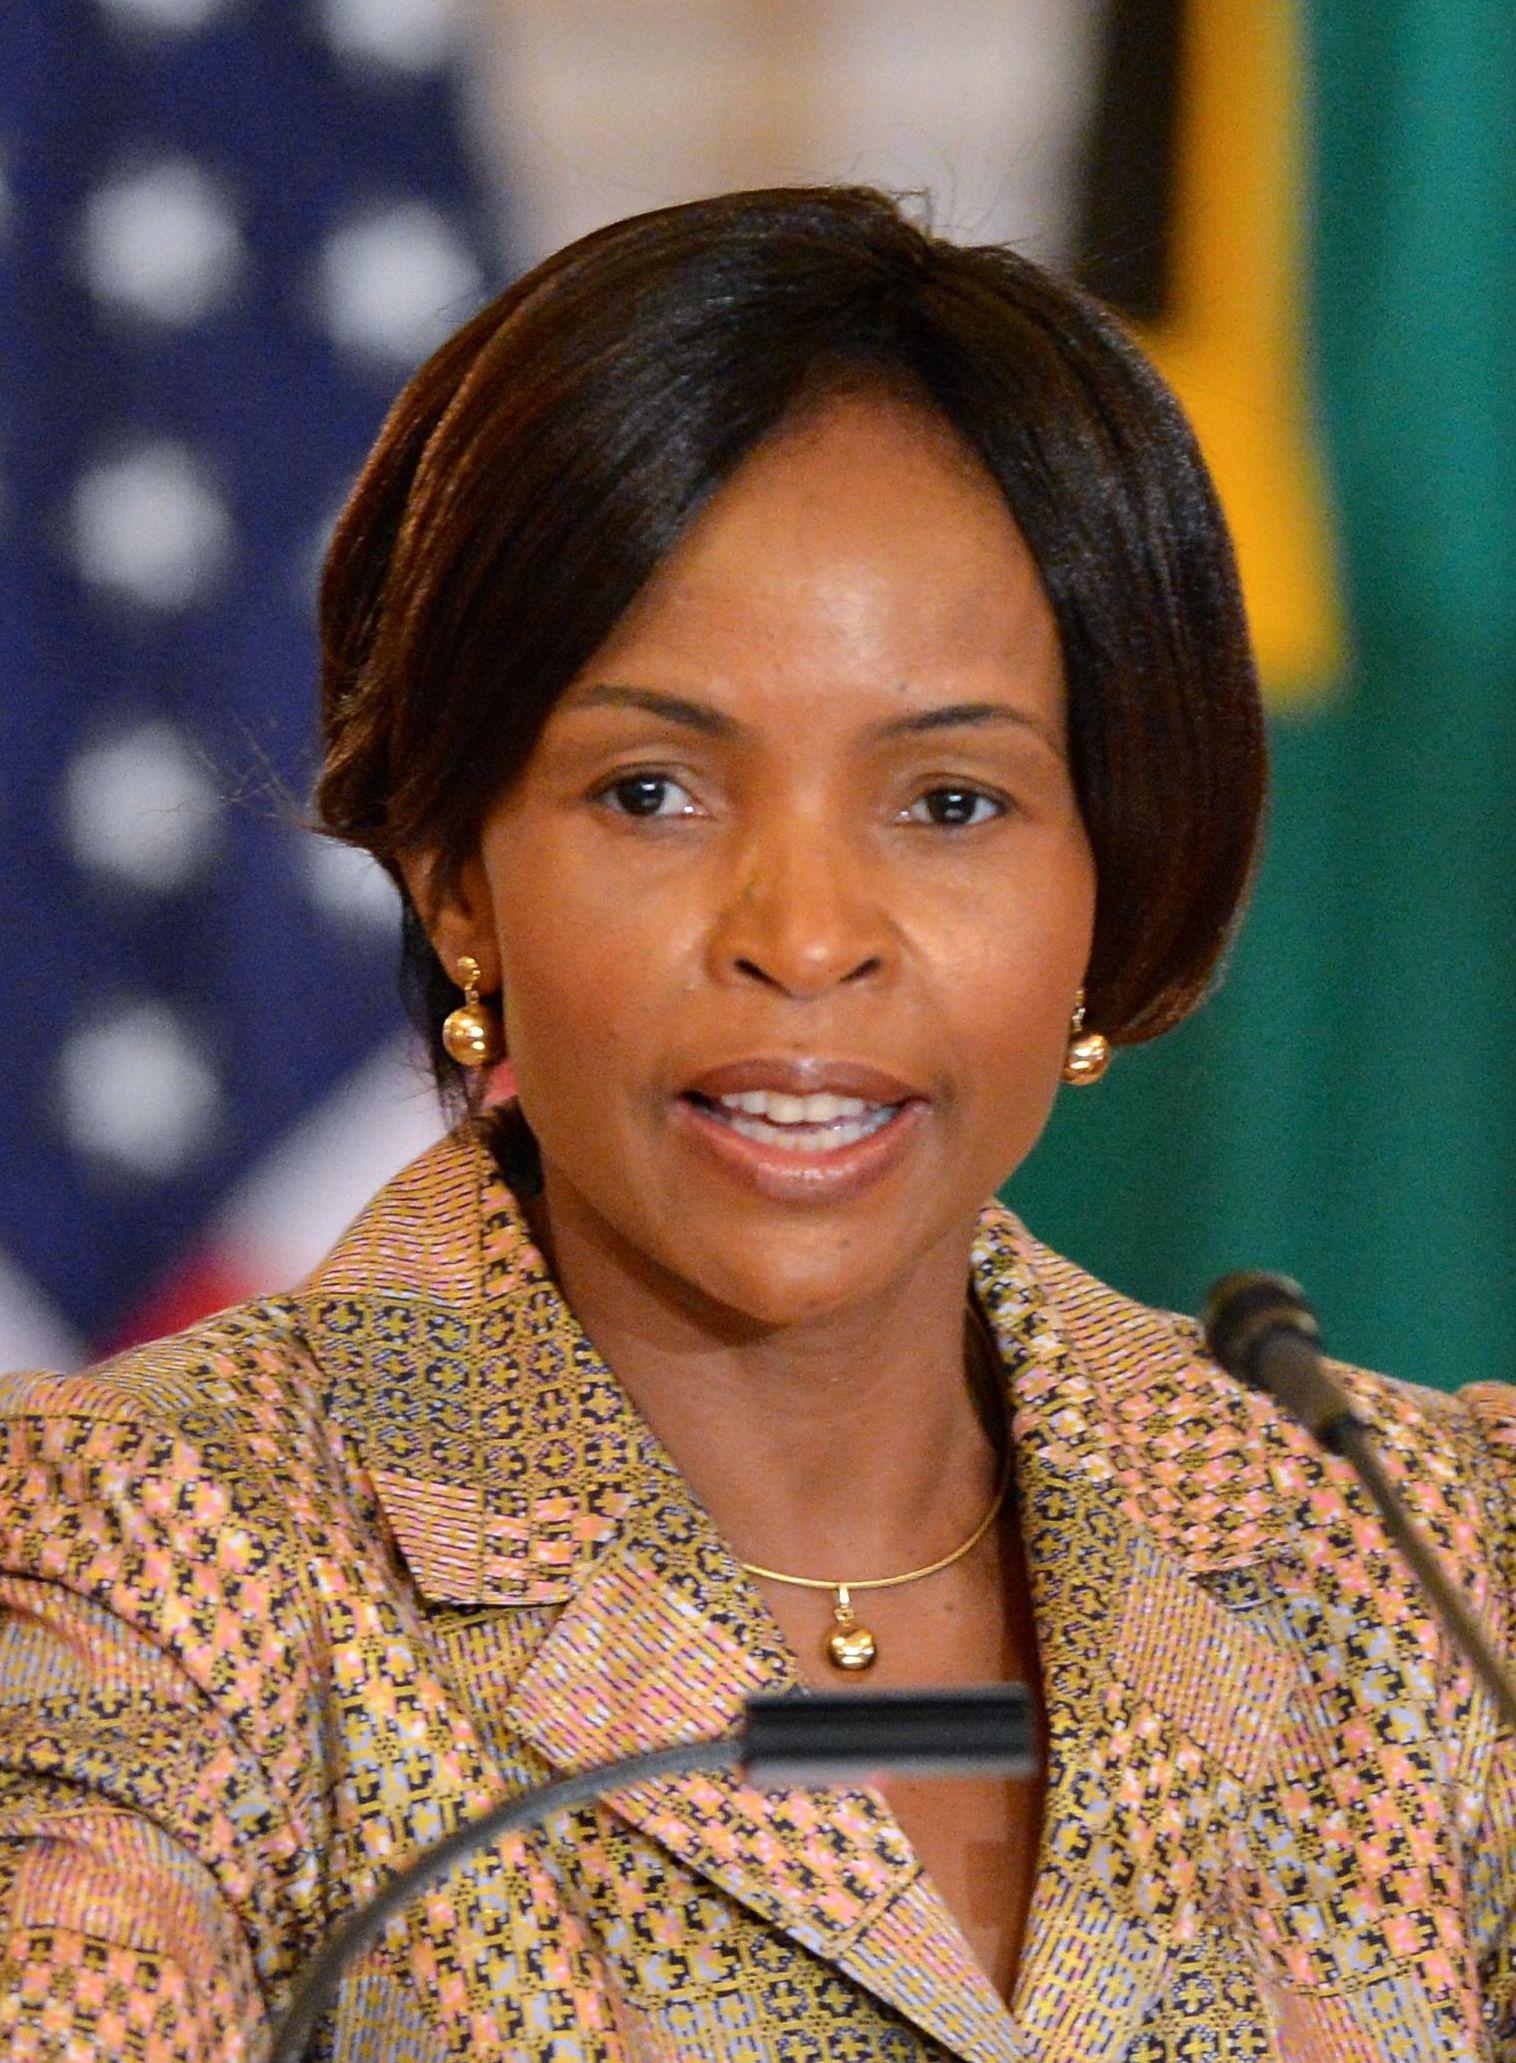 Nkosazana dlamini-zuma divorced dating